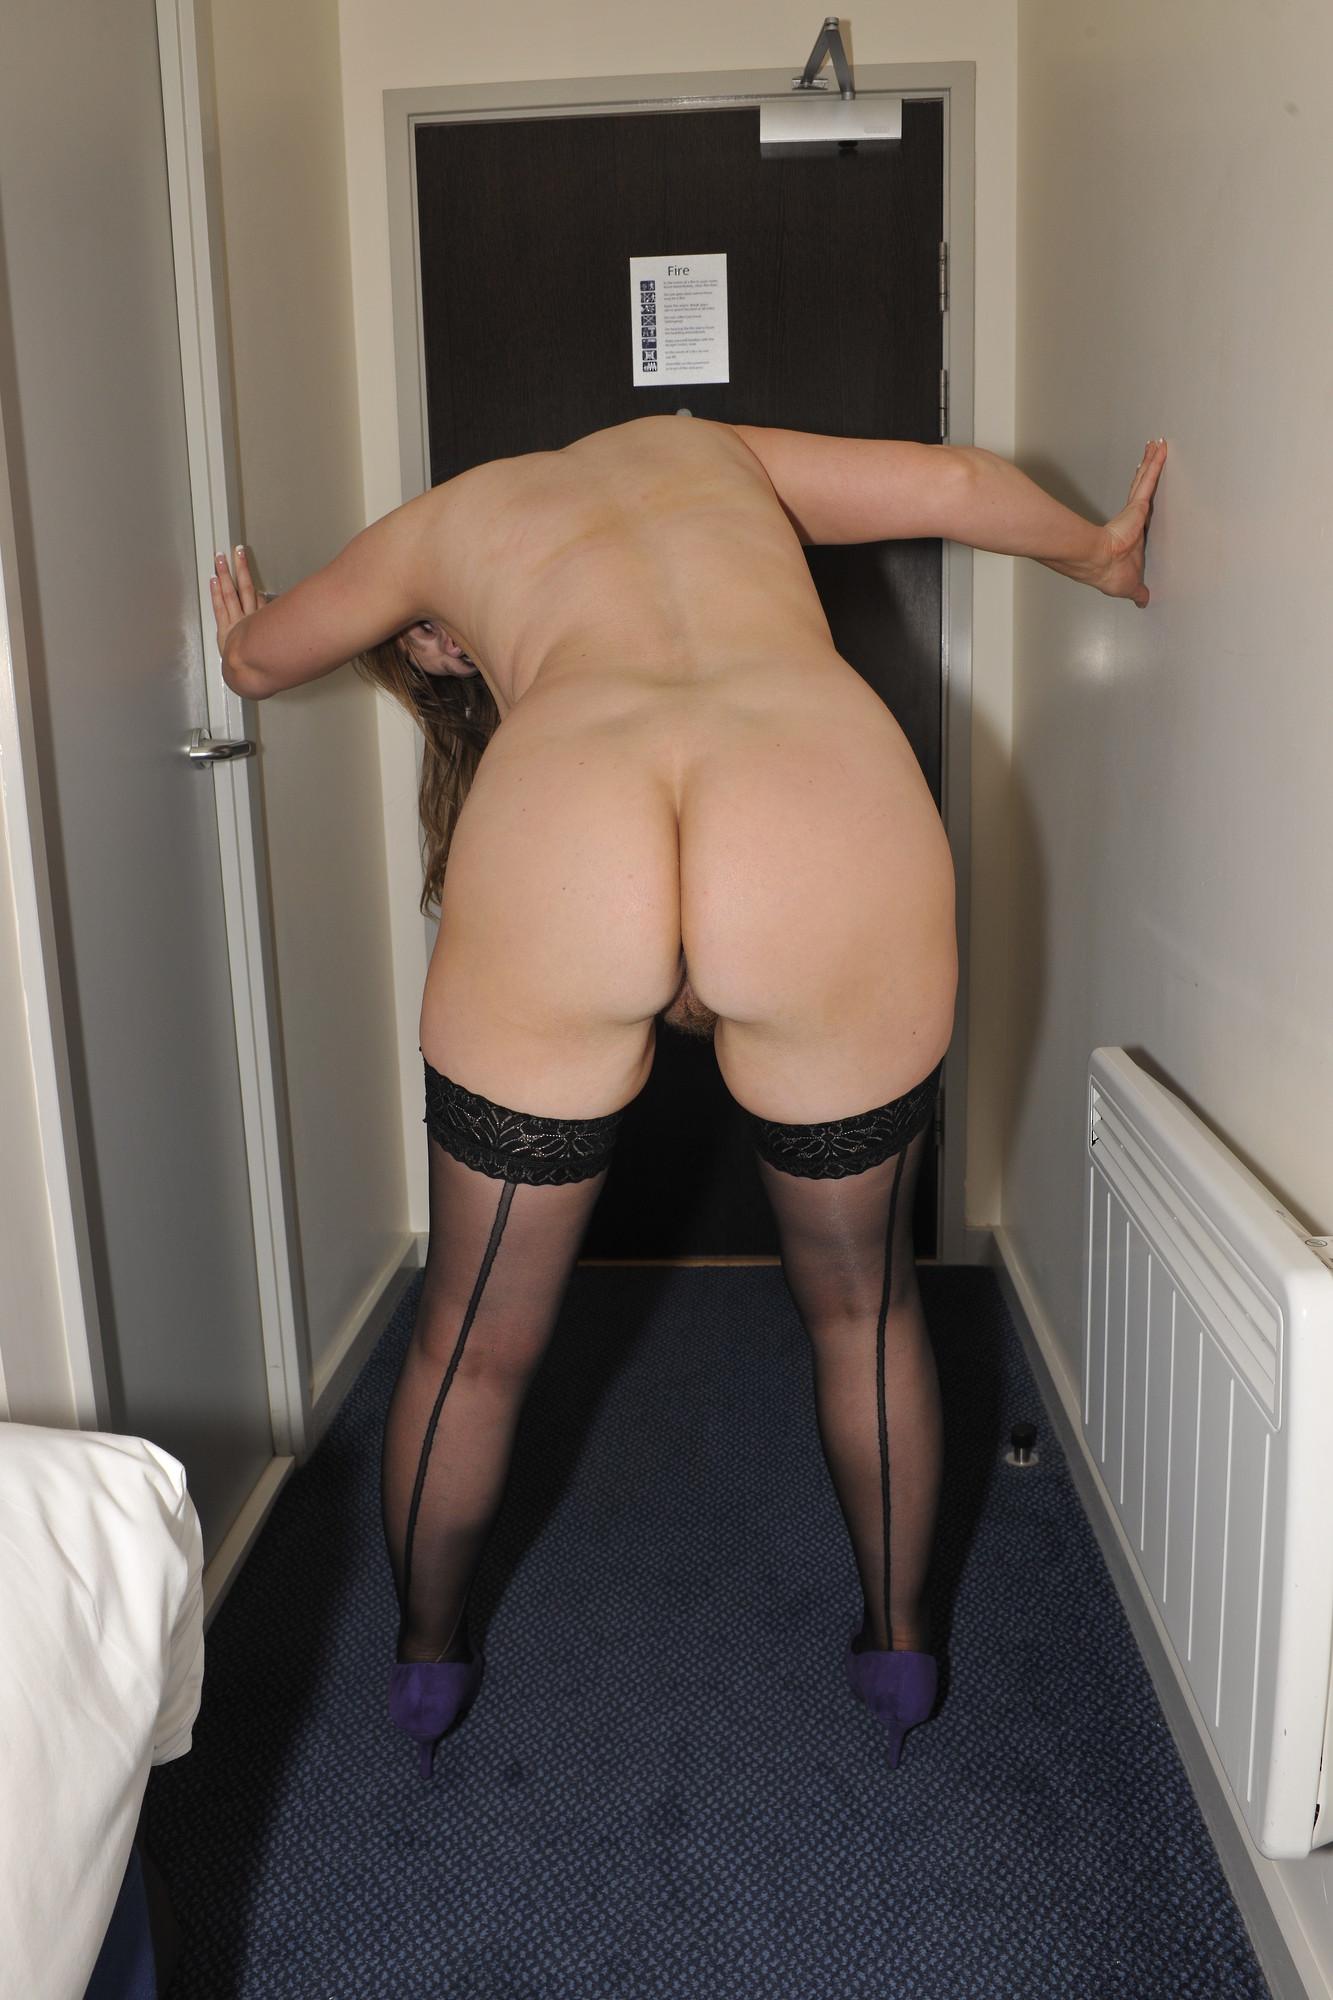 milf-pussy-caught-on-cam-big-booty-pornstars